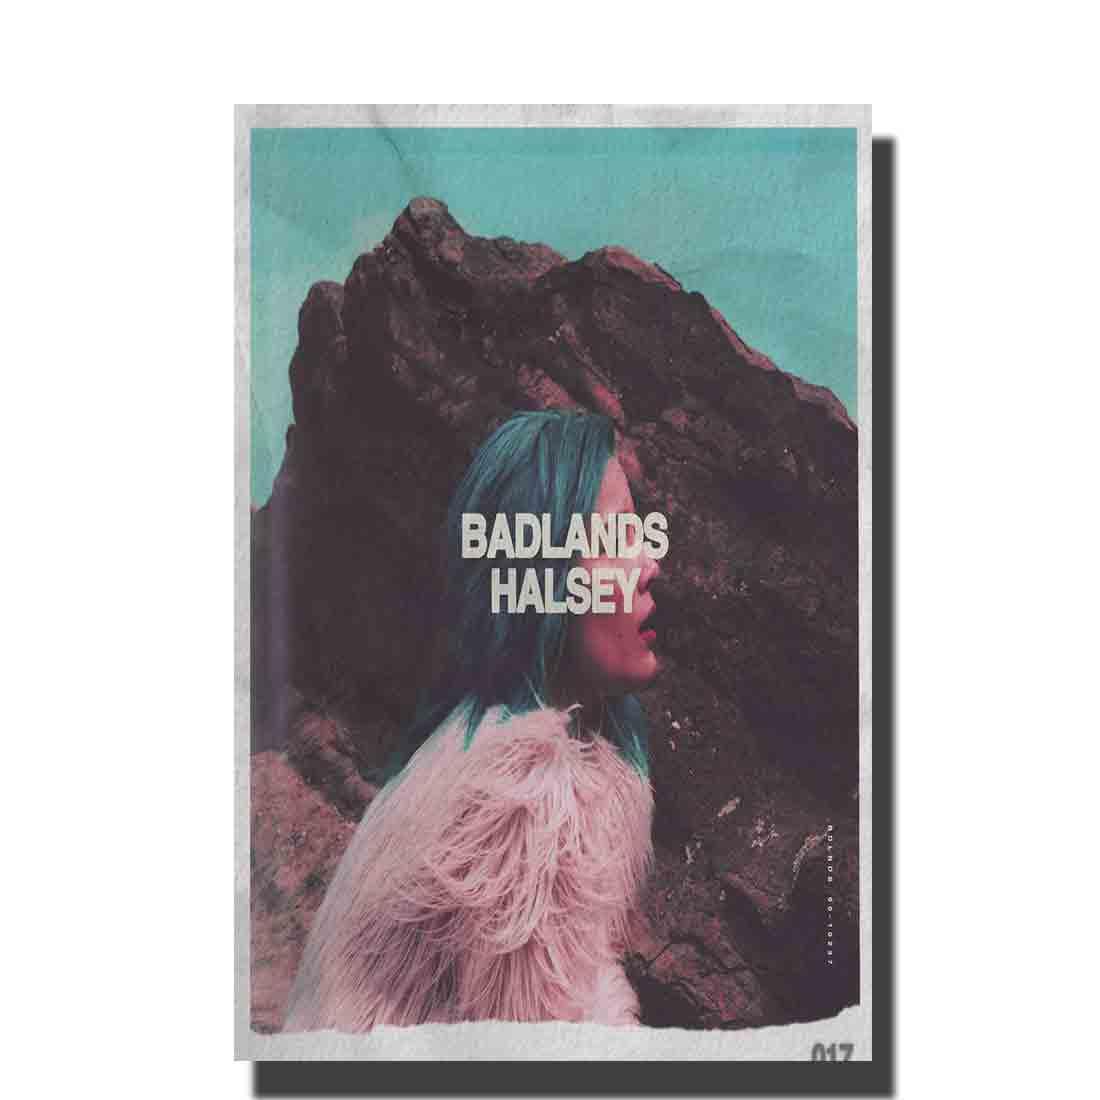 Cartel de arte Halsey badland álbum de música cubierta cantante Star pared lienzo moderno para pintura Decor12x18 24x36 27x40